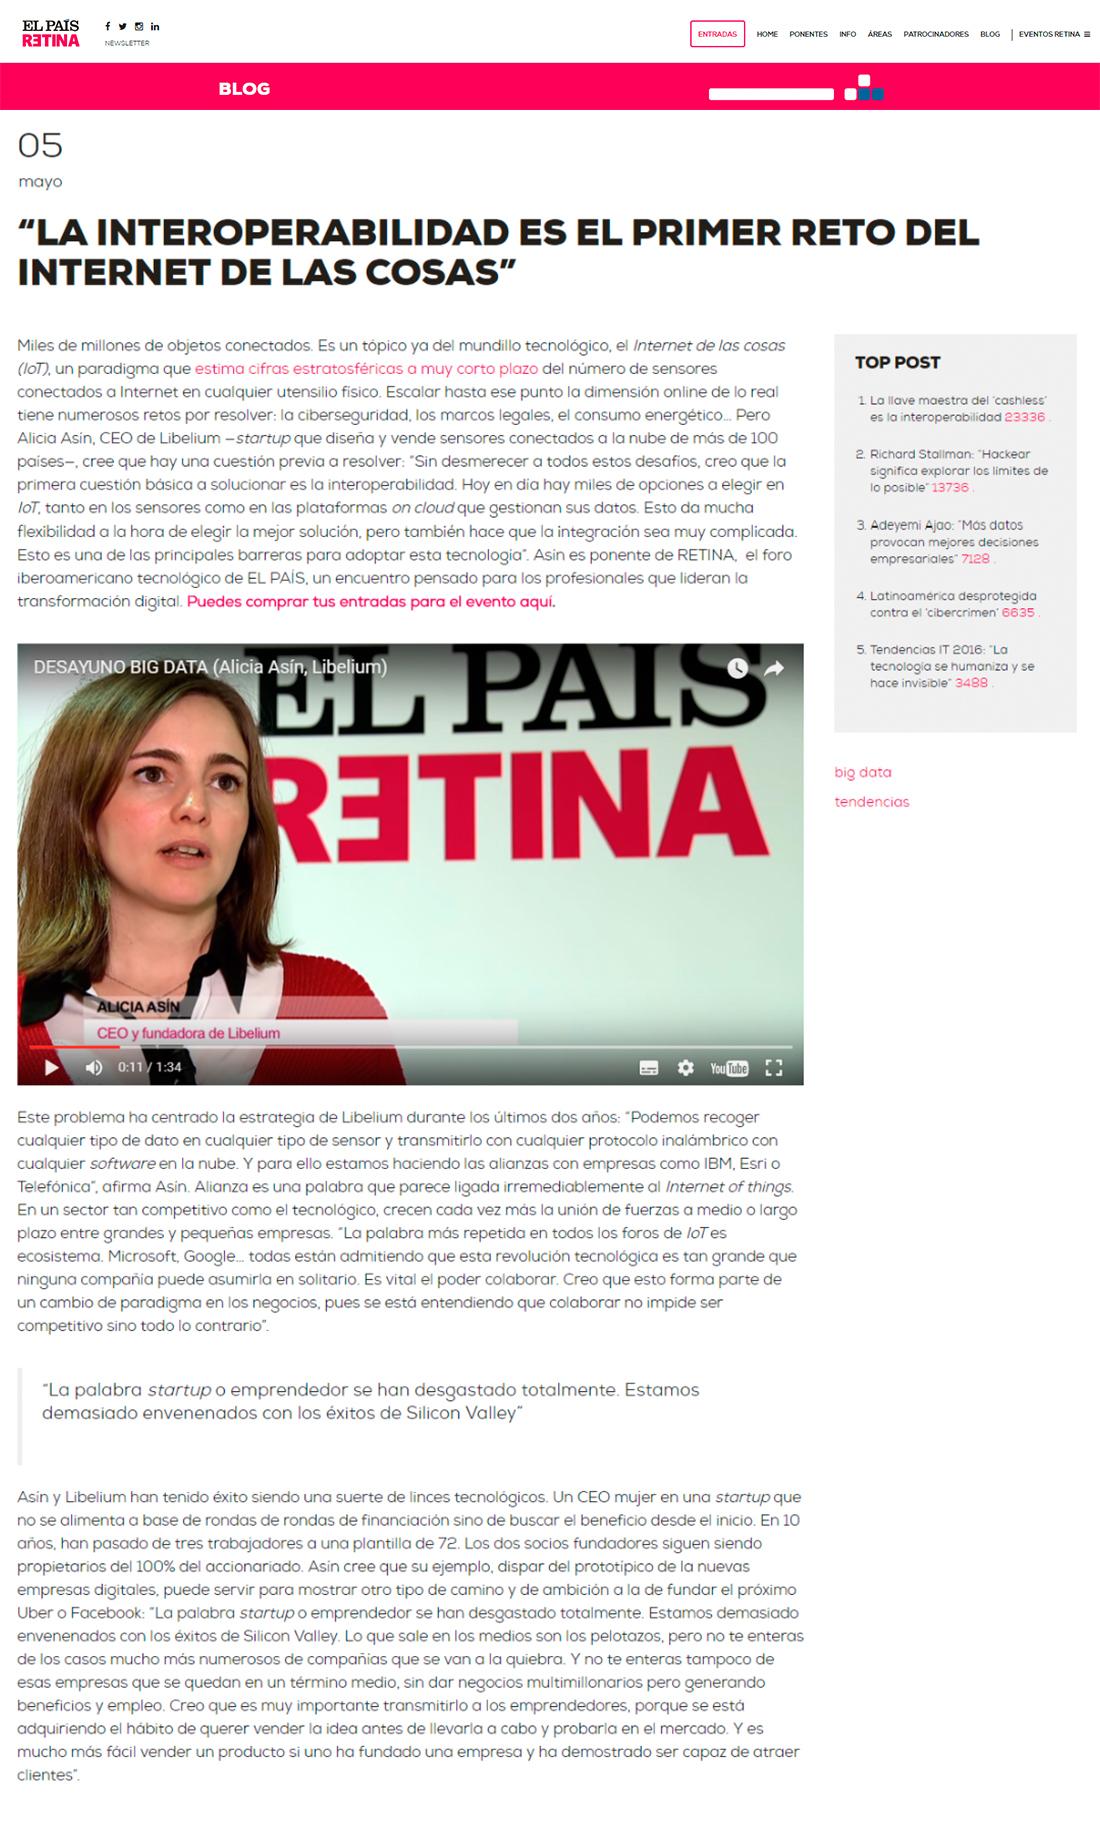 ElPaisRetina.com – La interoperabilidad es el primer reto del Internet de las Cosas